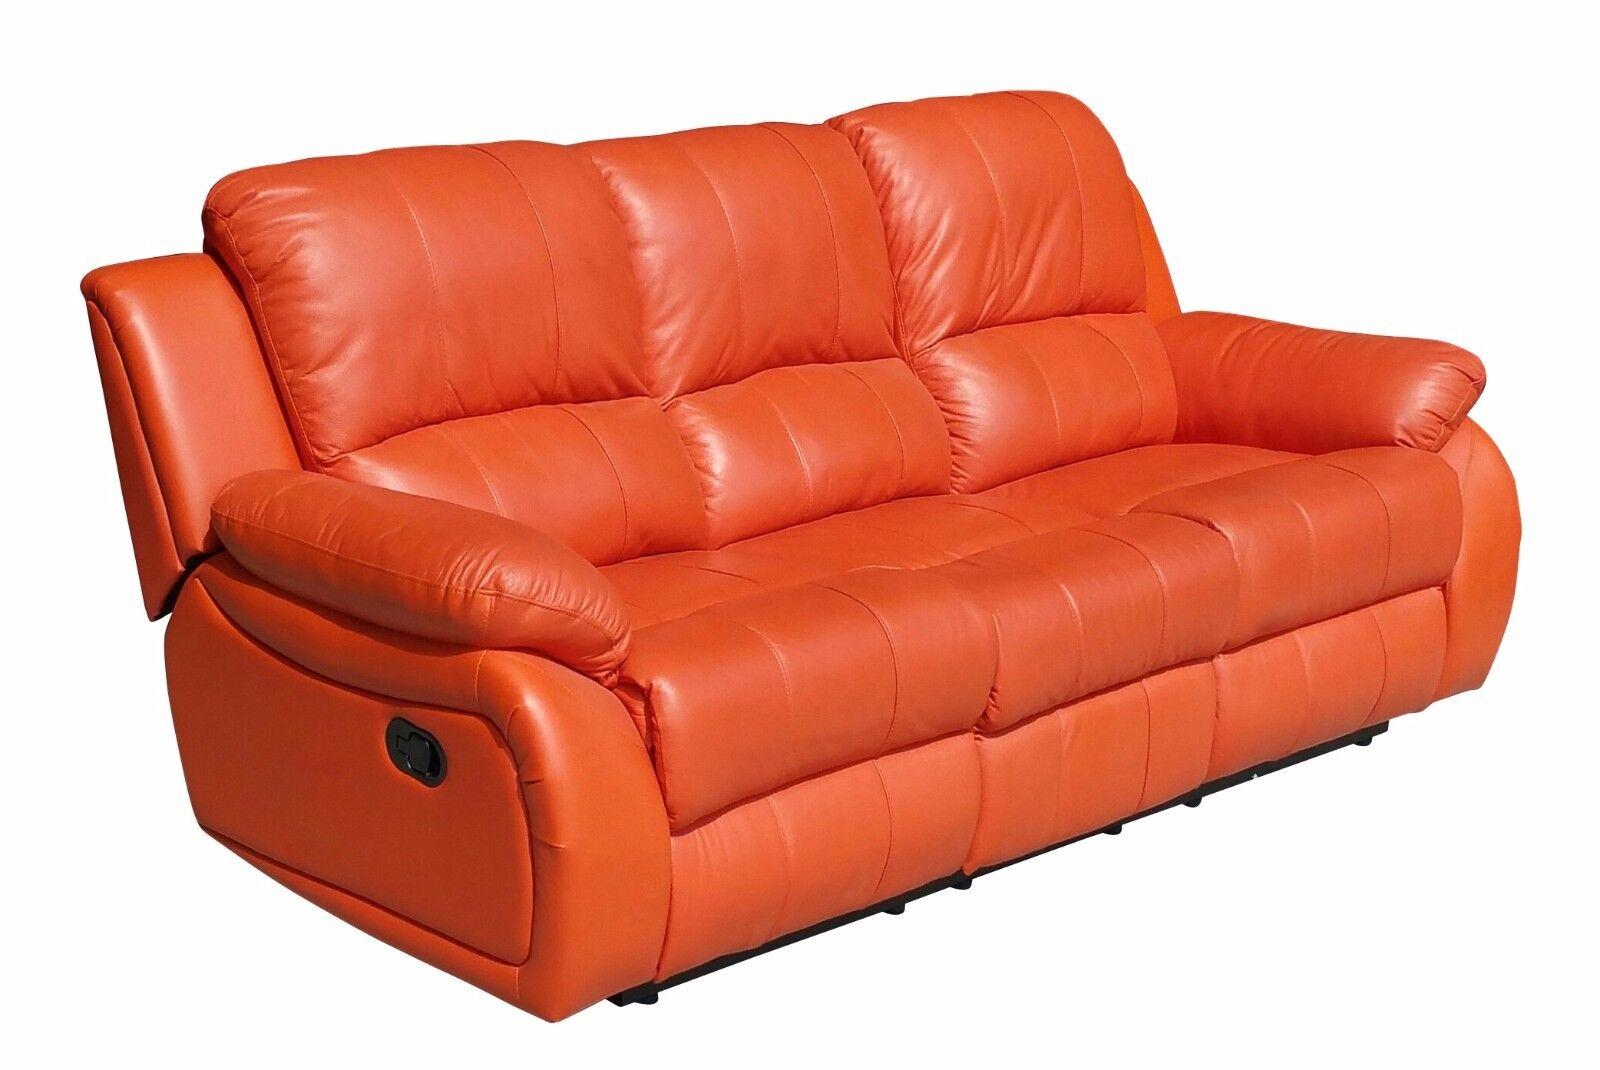 Voll leder couch sofas garnitur relaxsessel fernsehsessel for Couch garnitur